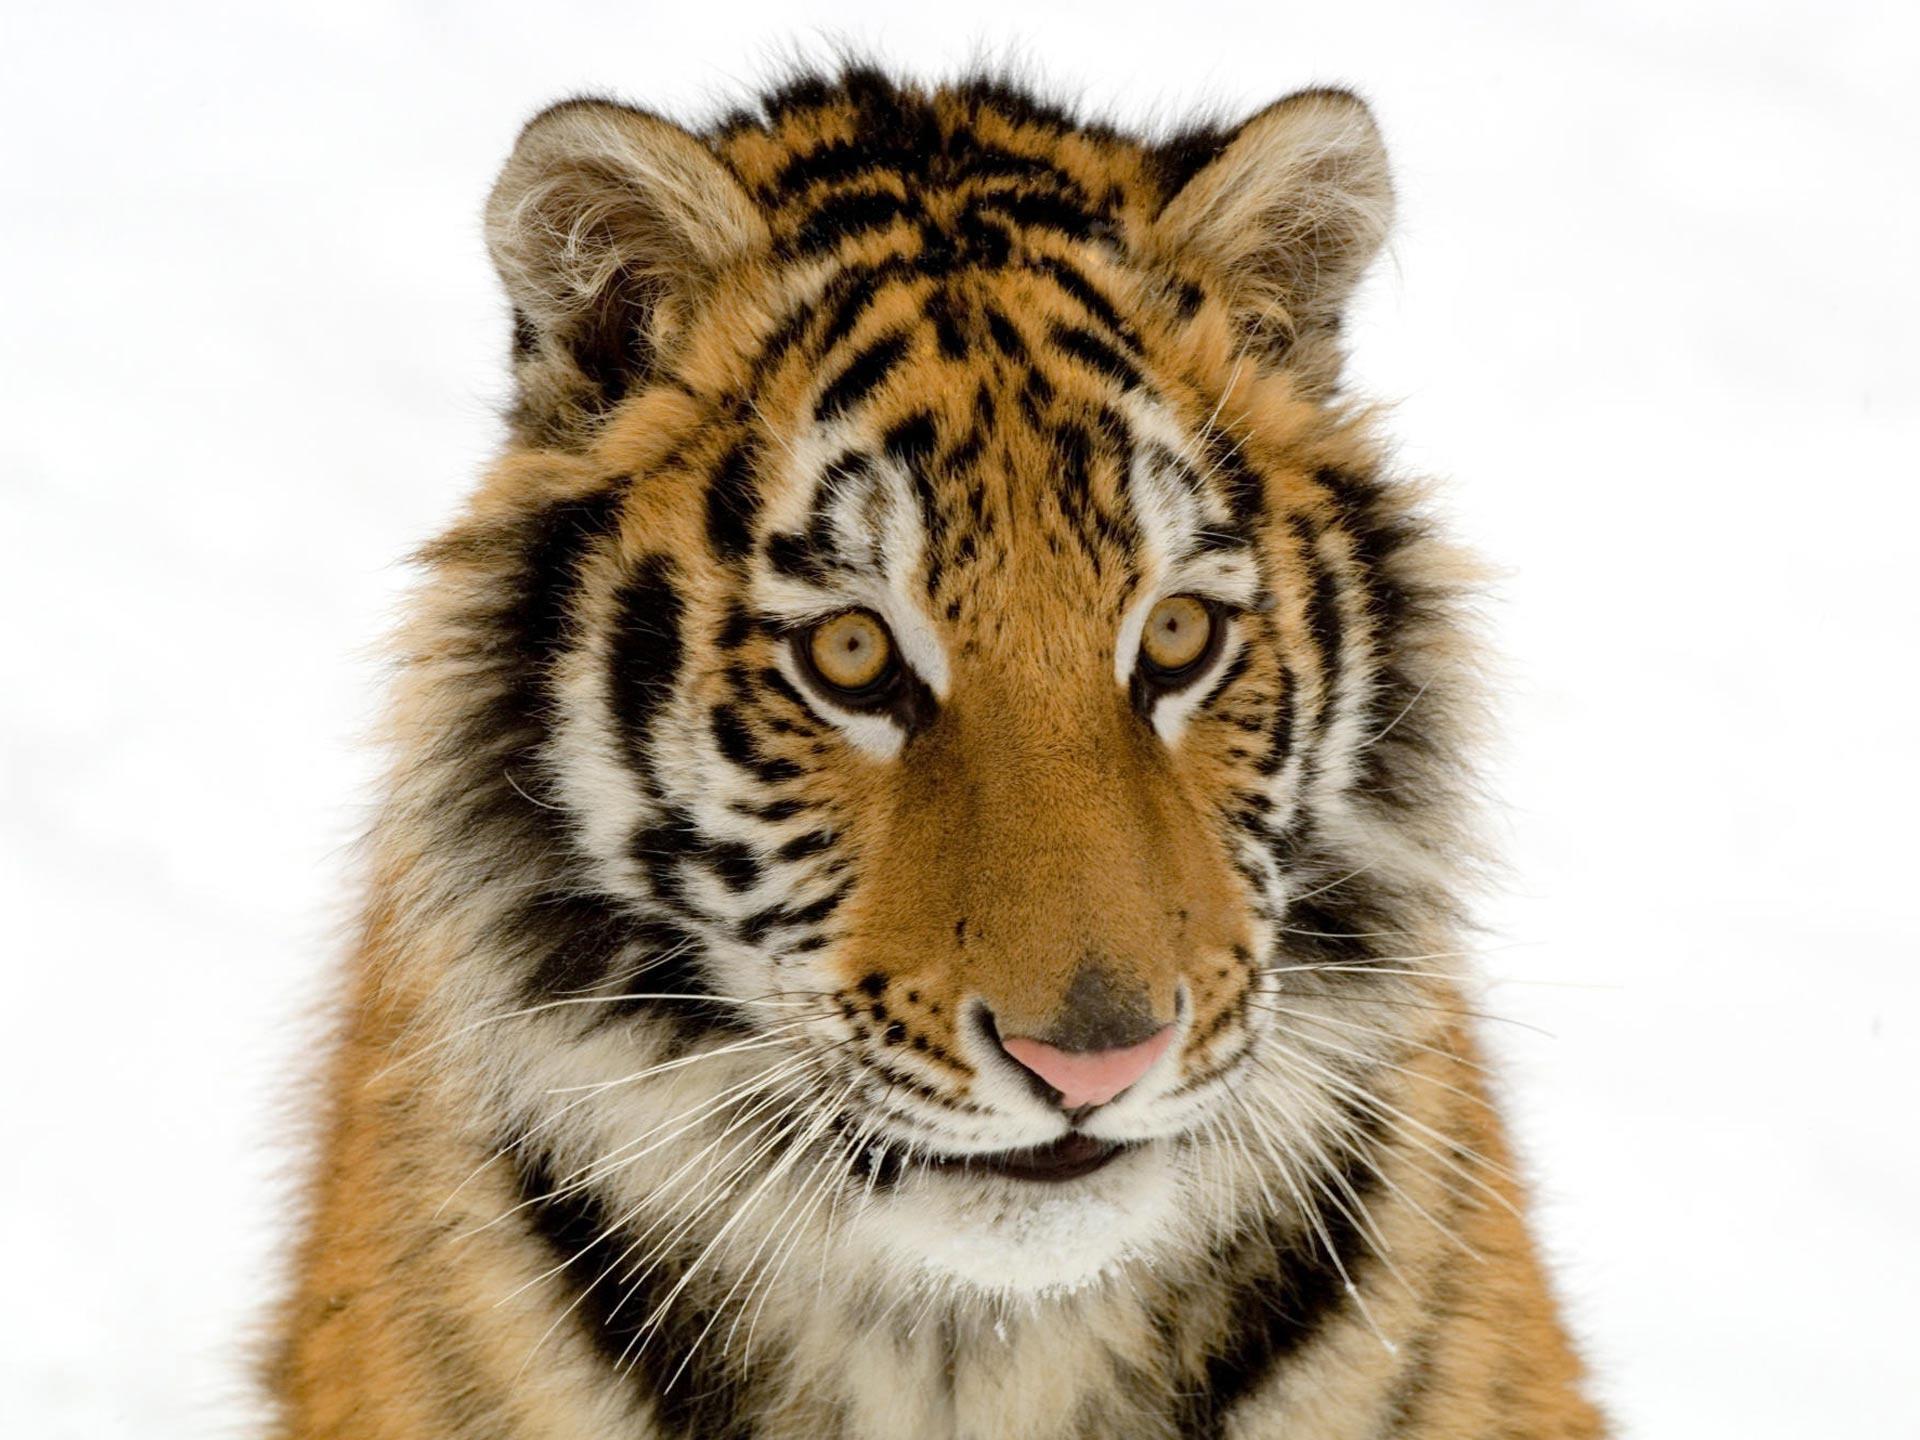 URL httpmobile wallpapersfeedionetbaby tiger desktop wallpaper 1920x1440